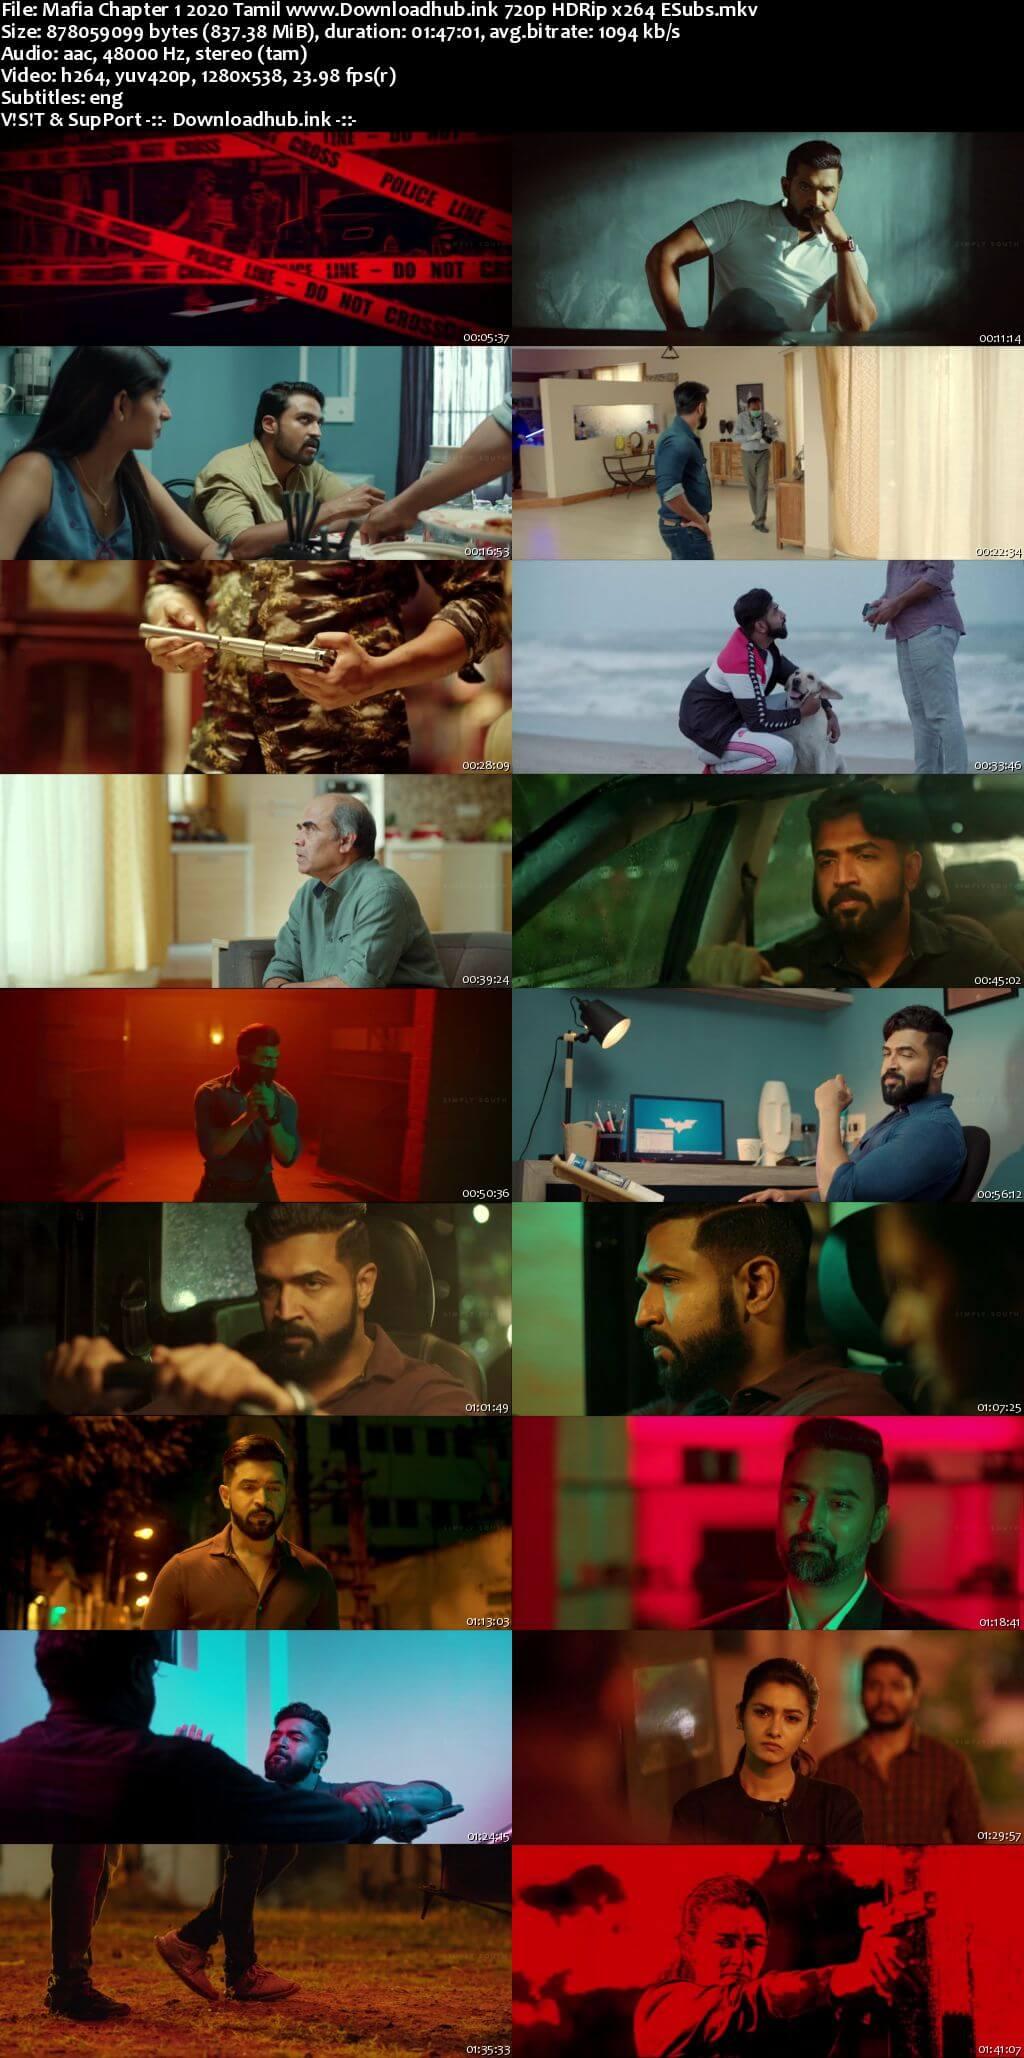 Mafia Chapter 1 2020 Tamil 720p HDRip ESubs